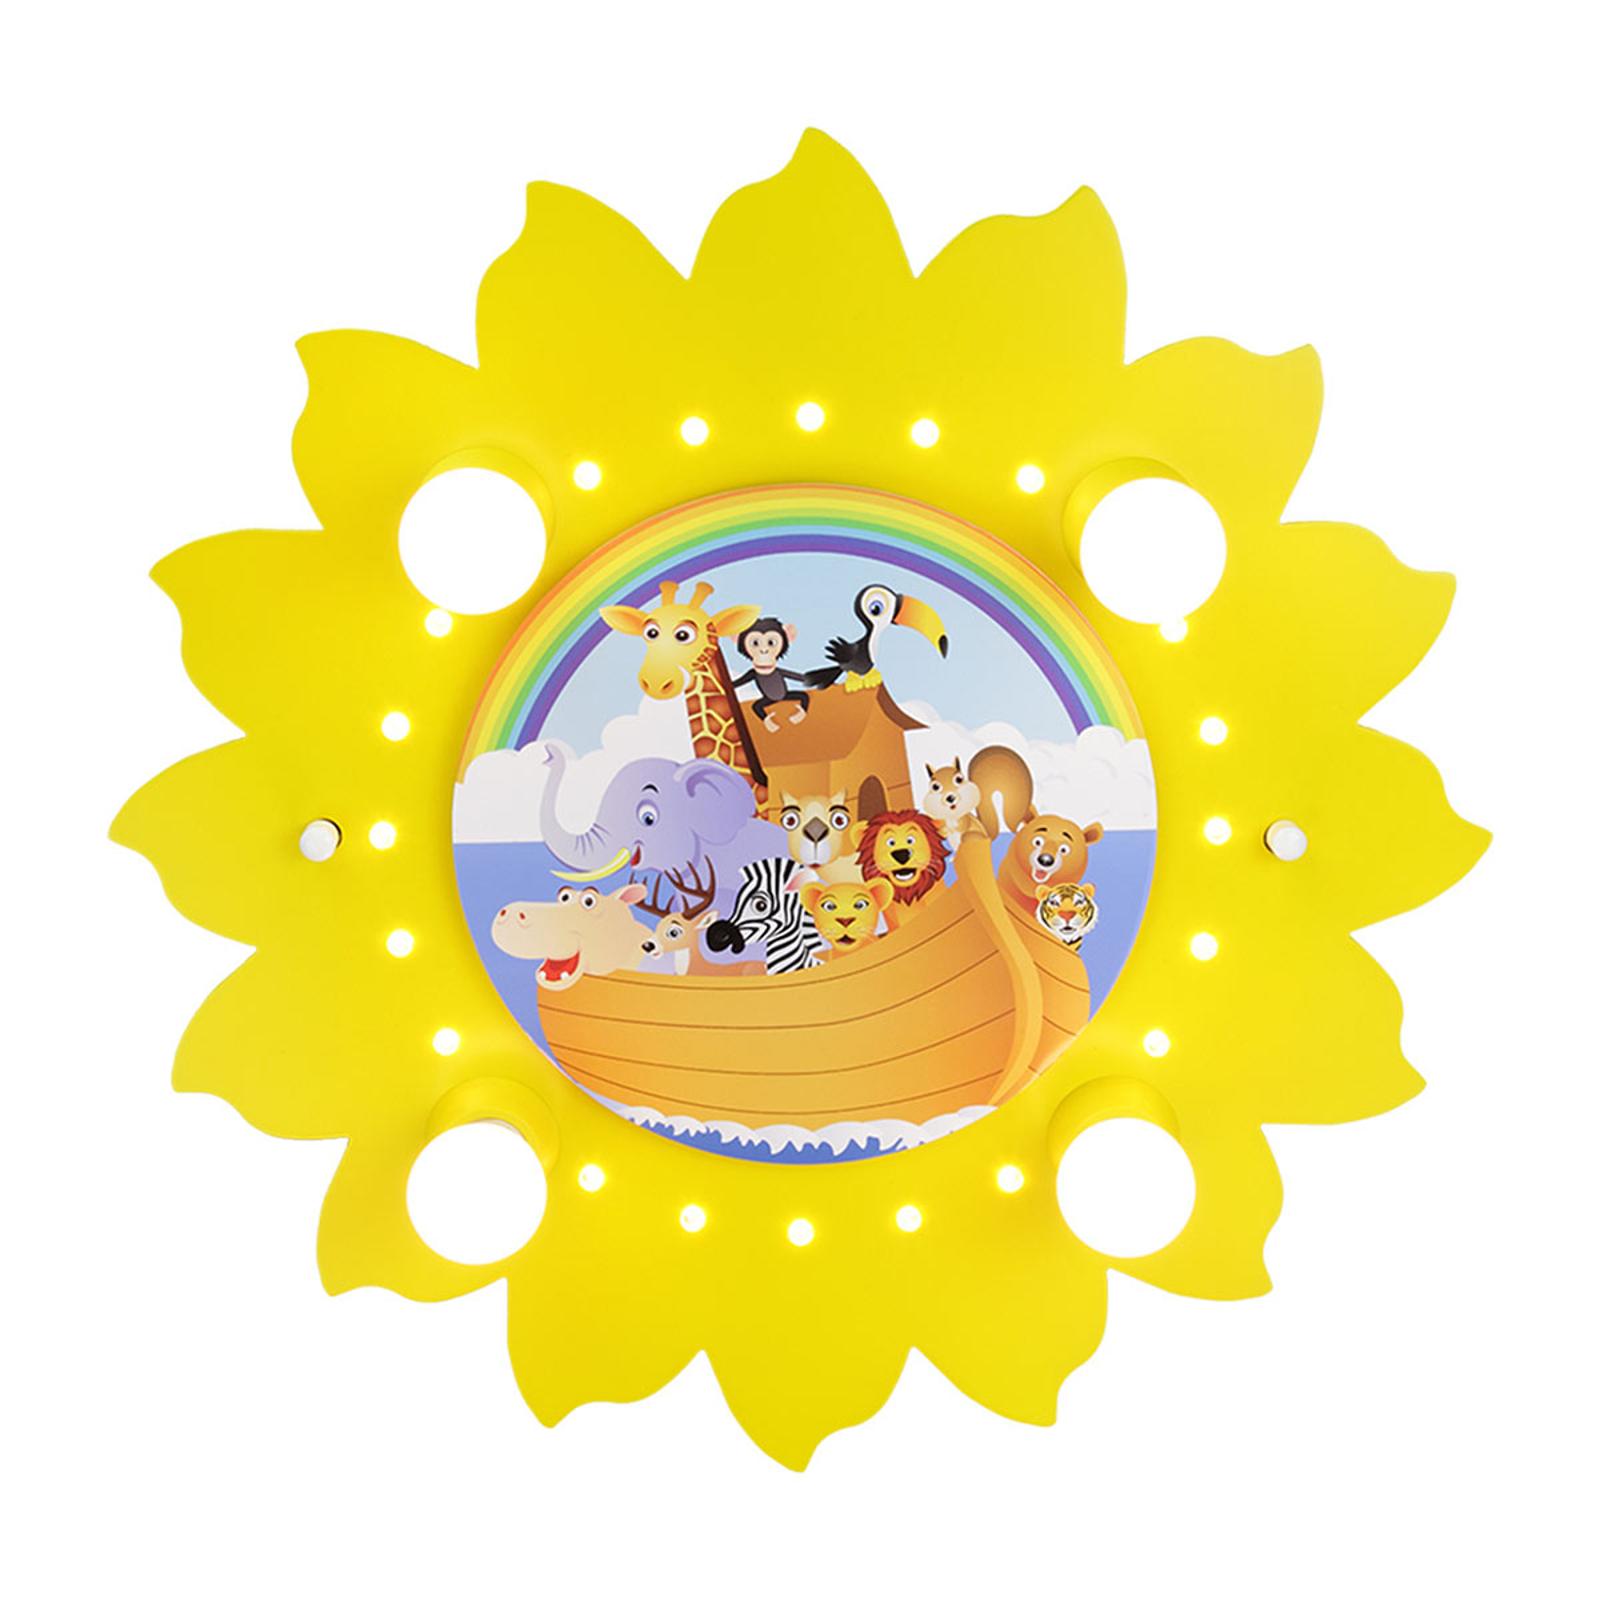 Lampa sufitowa Słońce arka żółta, 4-punktowa